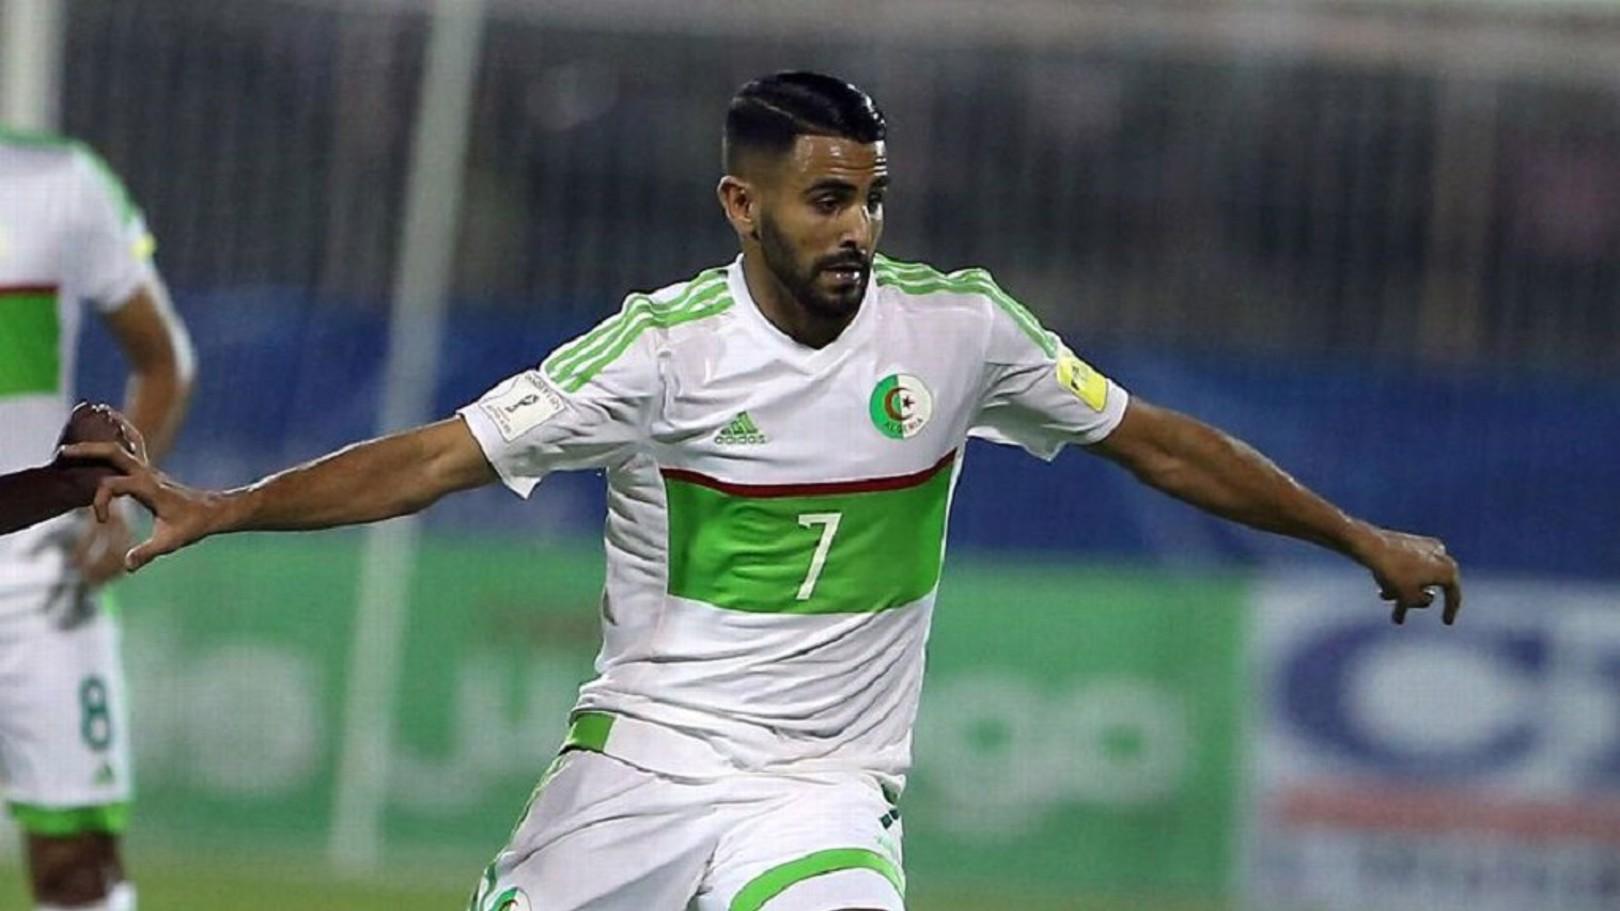 Mahrez envoie l'Algérie en quarts de la CAN